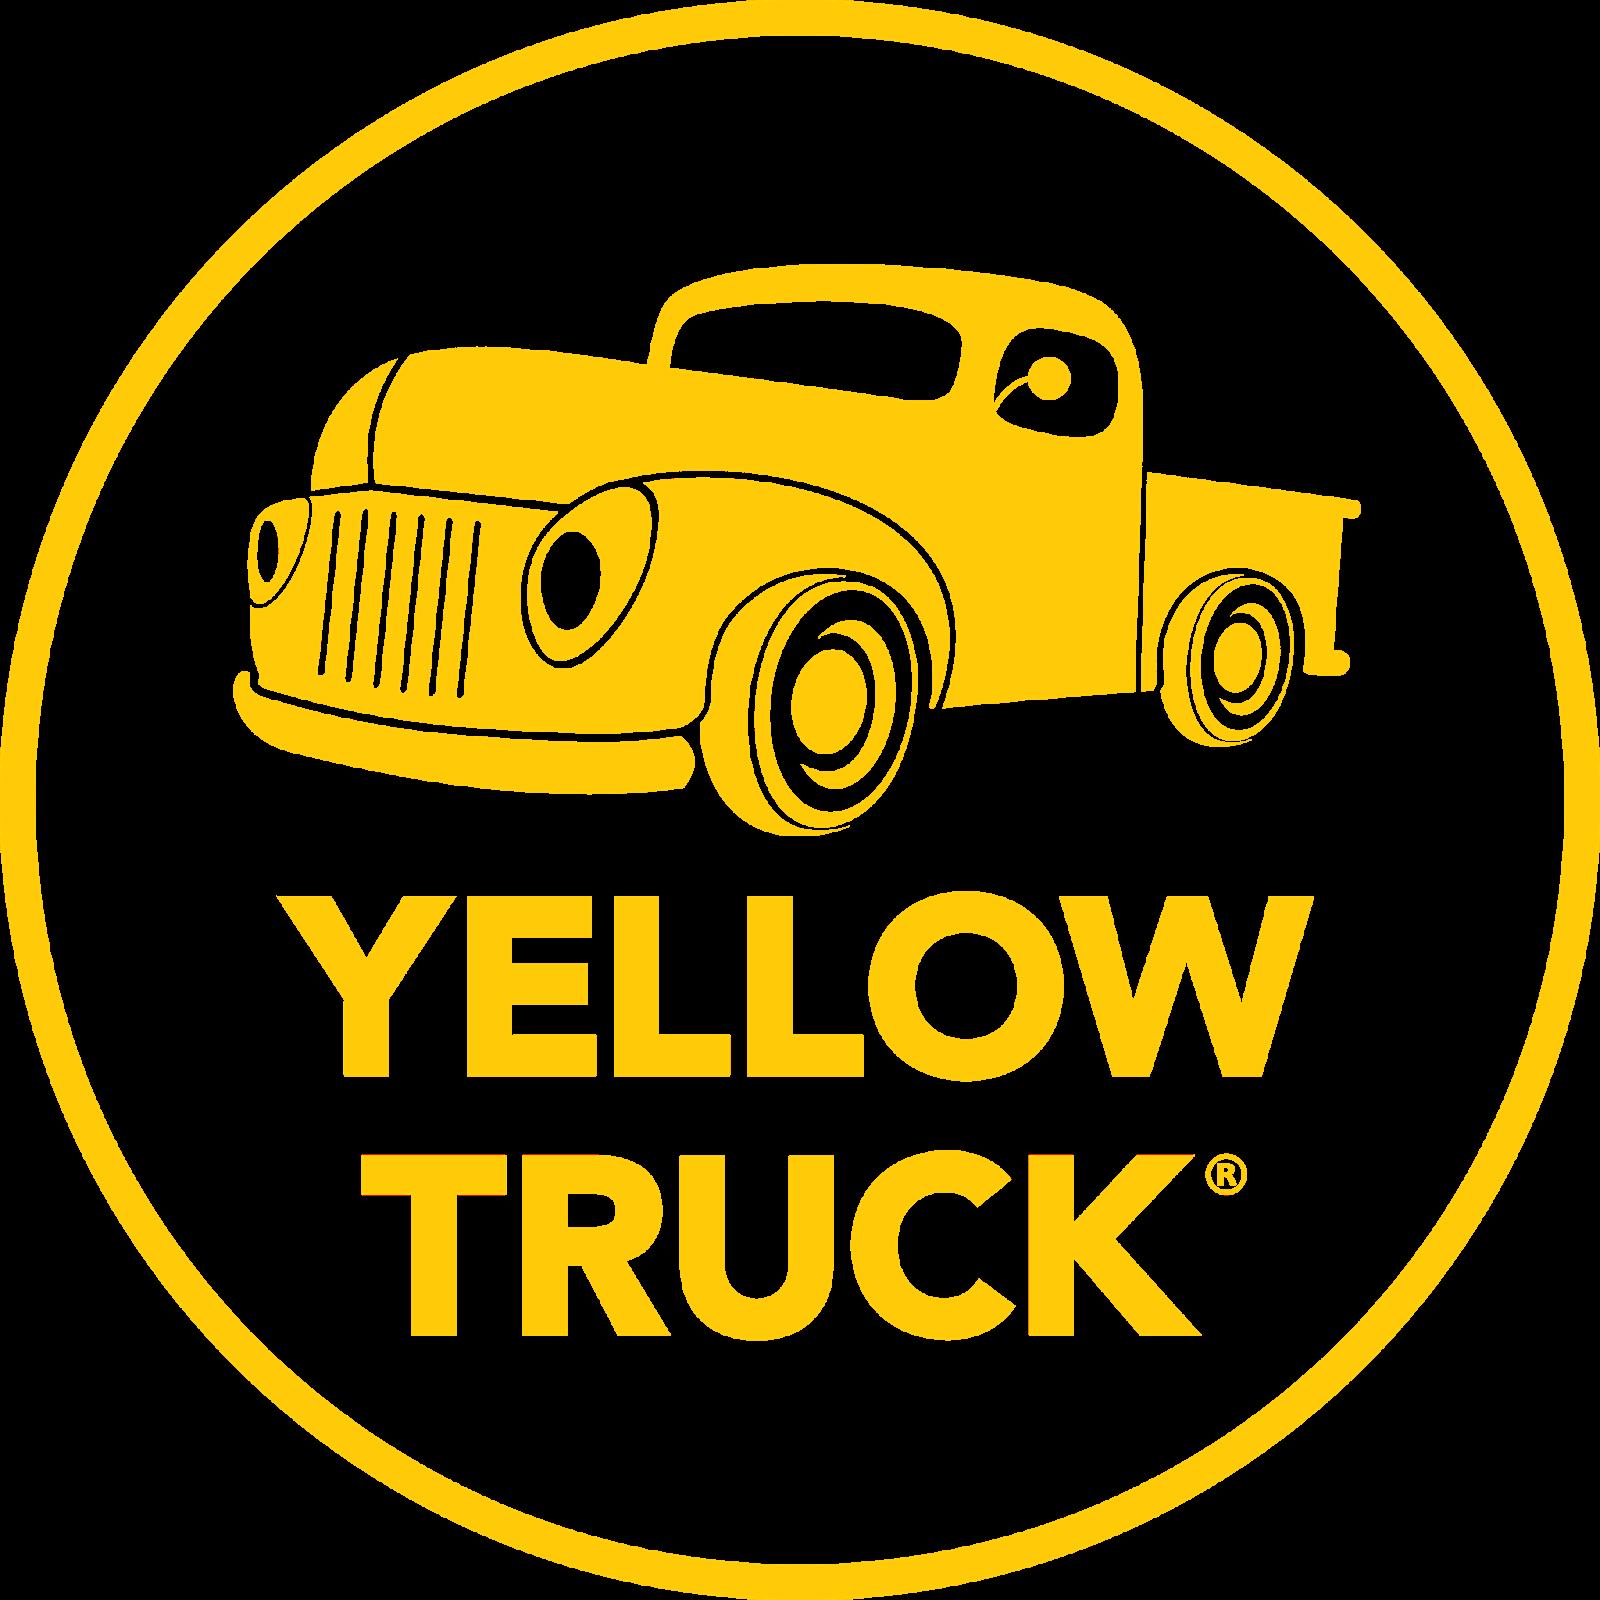 Lowongan Barista Cook Di Yellow Truck Coffee Yogyakarta Portal Info Lowongan Kerja Jogja Yogyakarta 2021